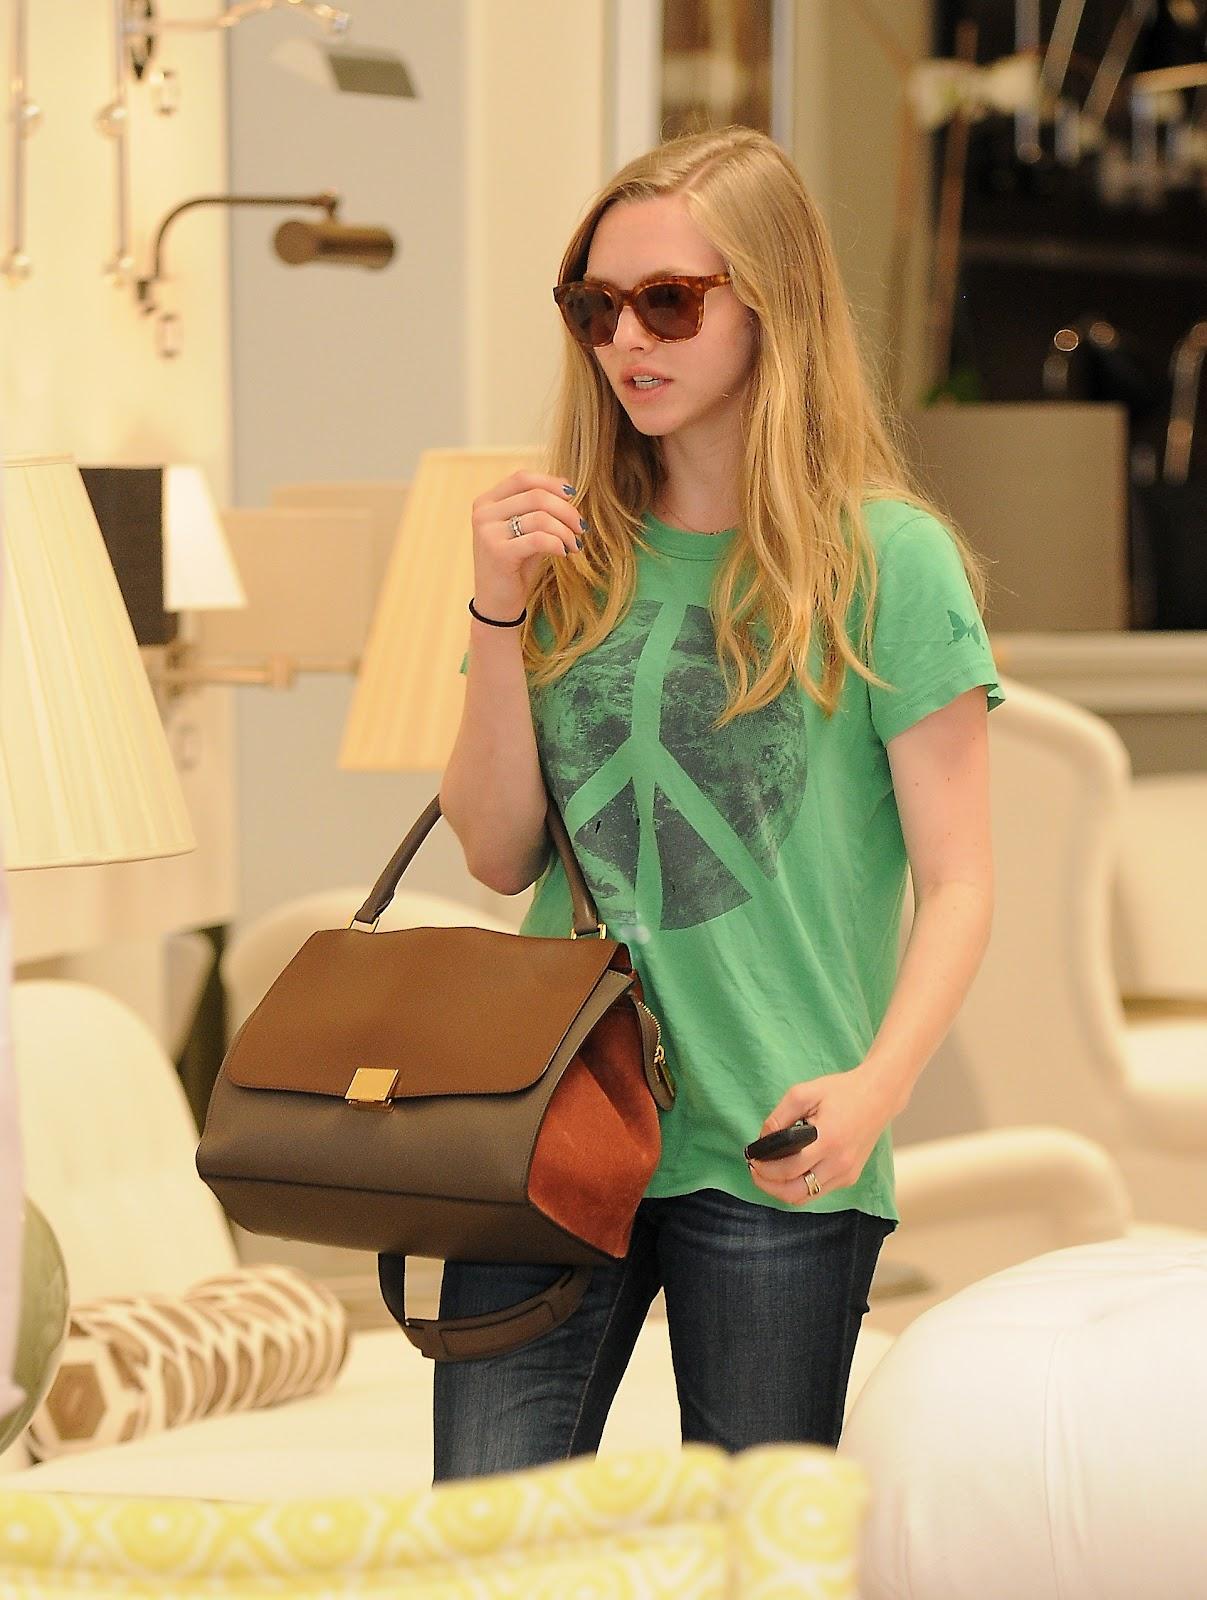 http://2.bp.blogspot.com/-97KgmbpvhGU/T90XfIfcNKI/AAAAAAAAIIc/bYaan2ZpM38/s1600/Actress+Amanda+Seyfried++at+Furniture+&+Fabrics+store+in+Los+Angeles+-07.jpg